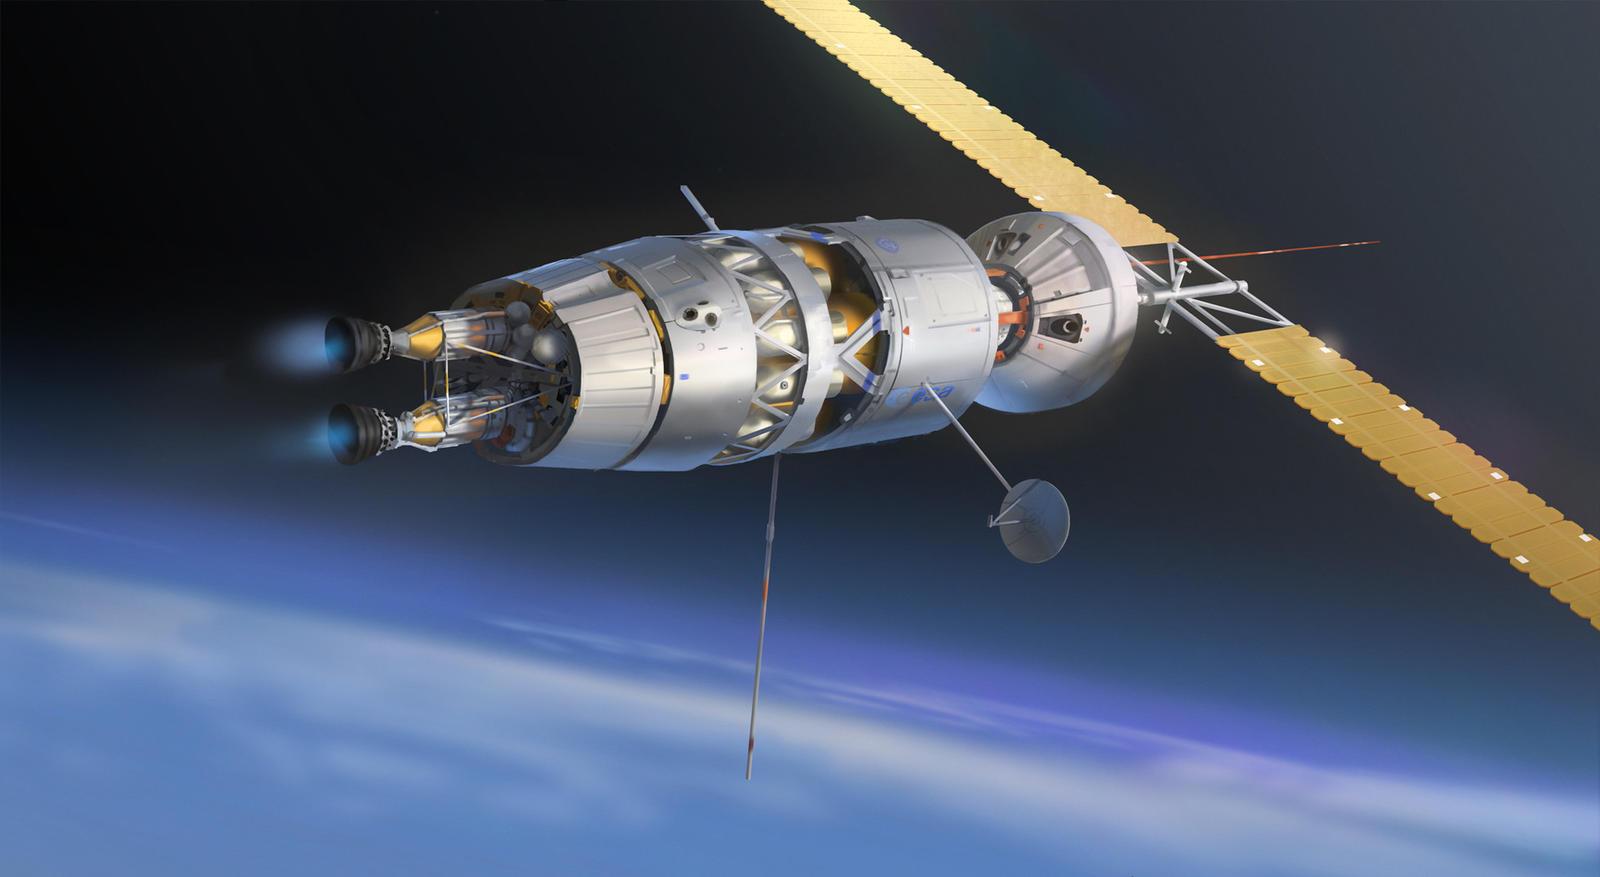 nuclear engine spaceship mars express by kurobot on deviantart